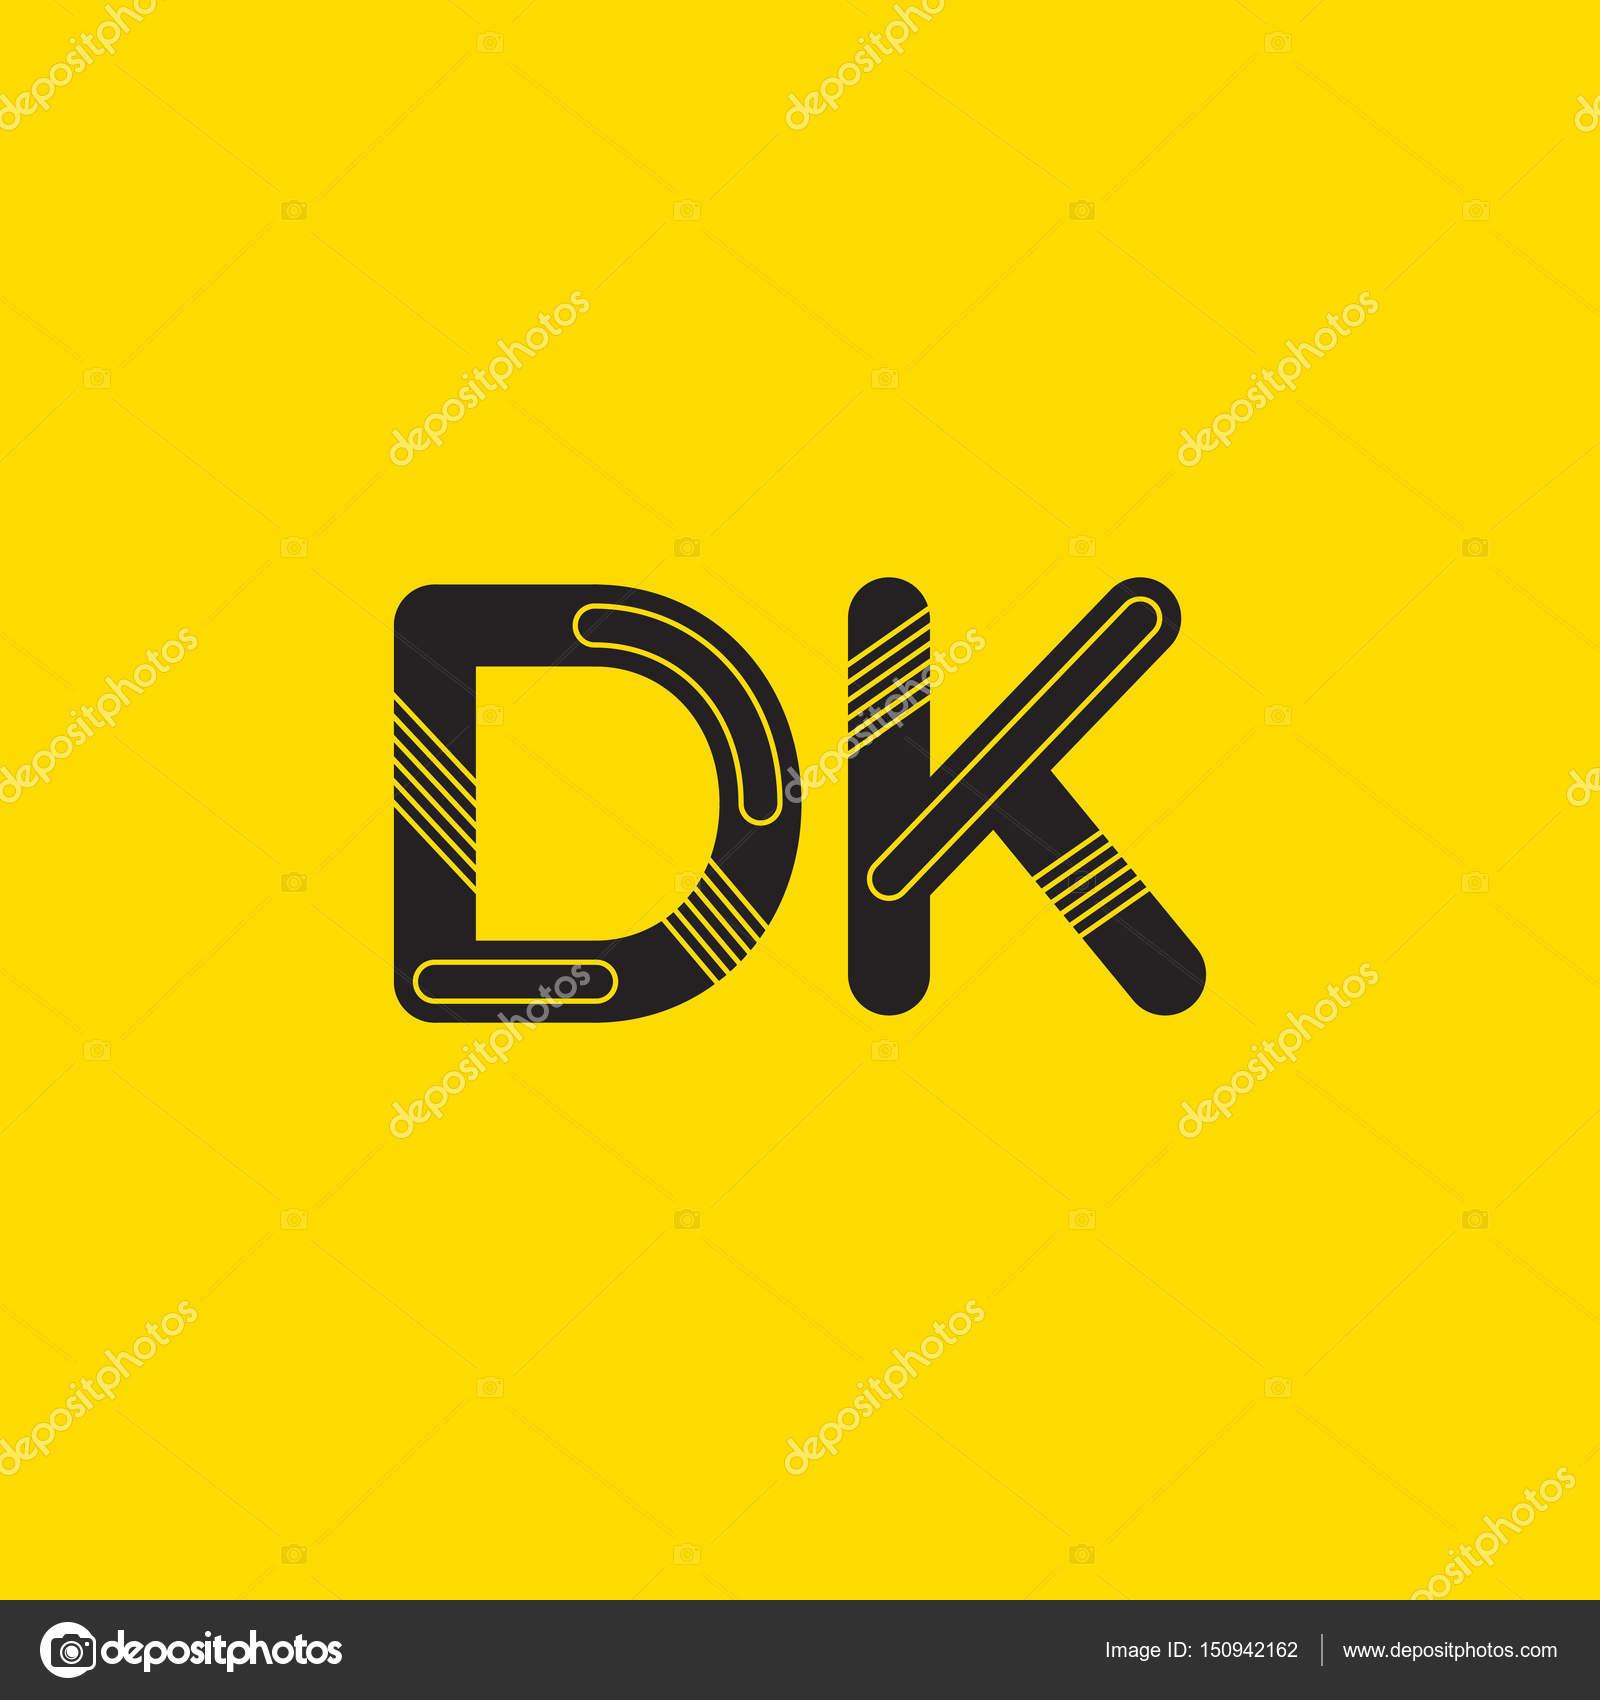 dk connected letters logo stock vector brainbistro 150942162